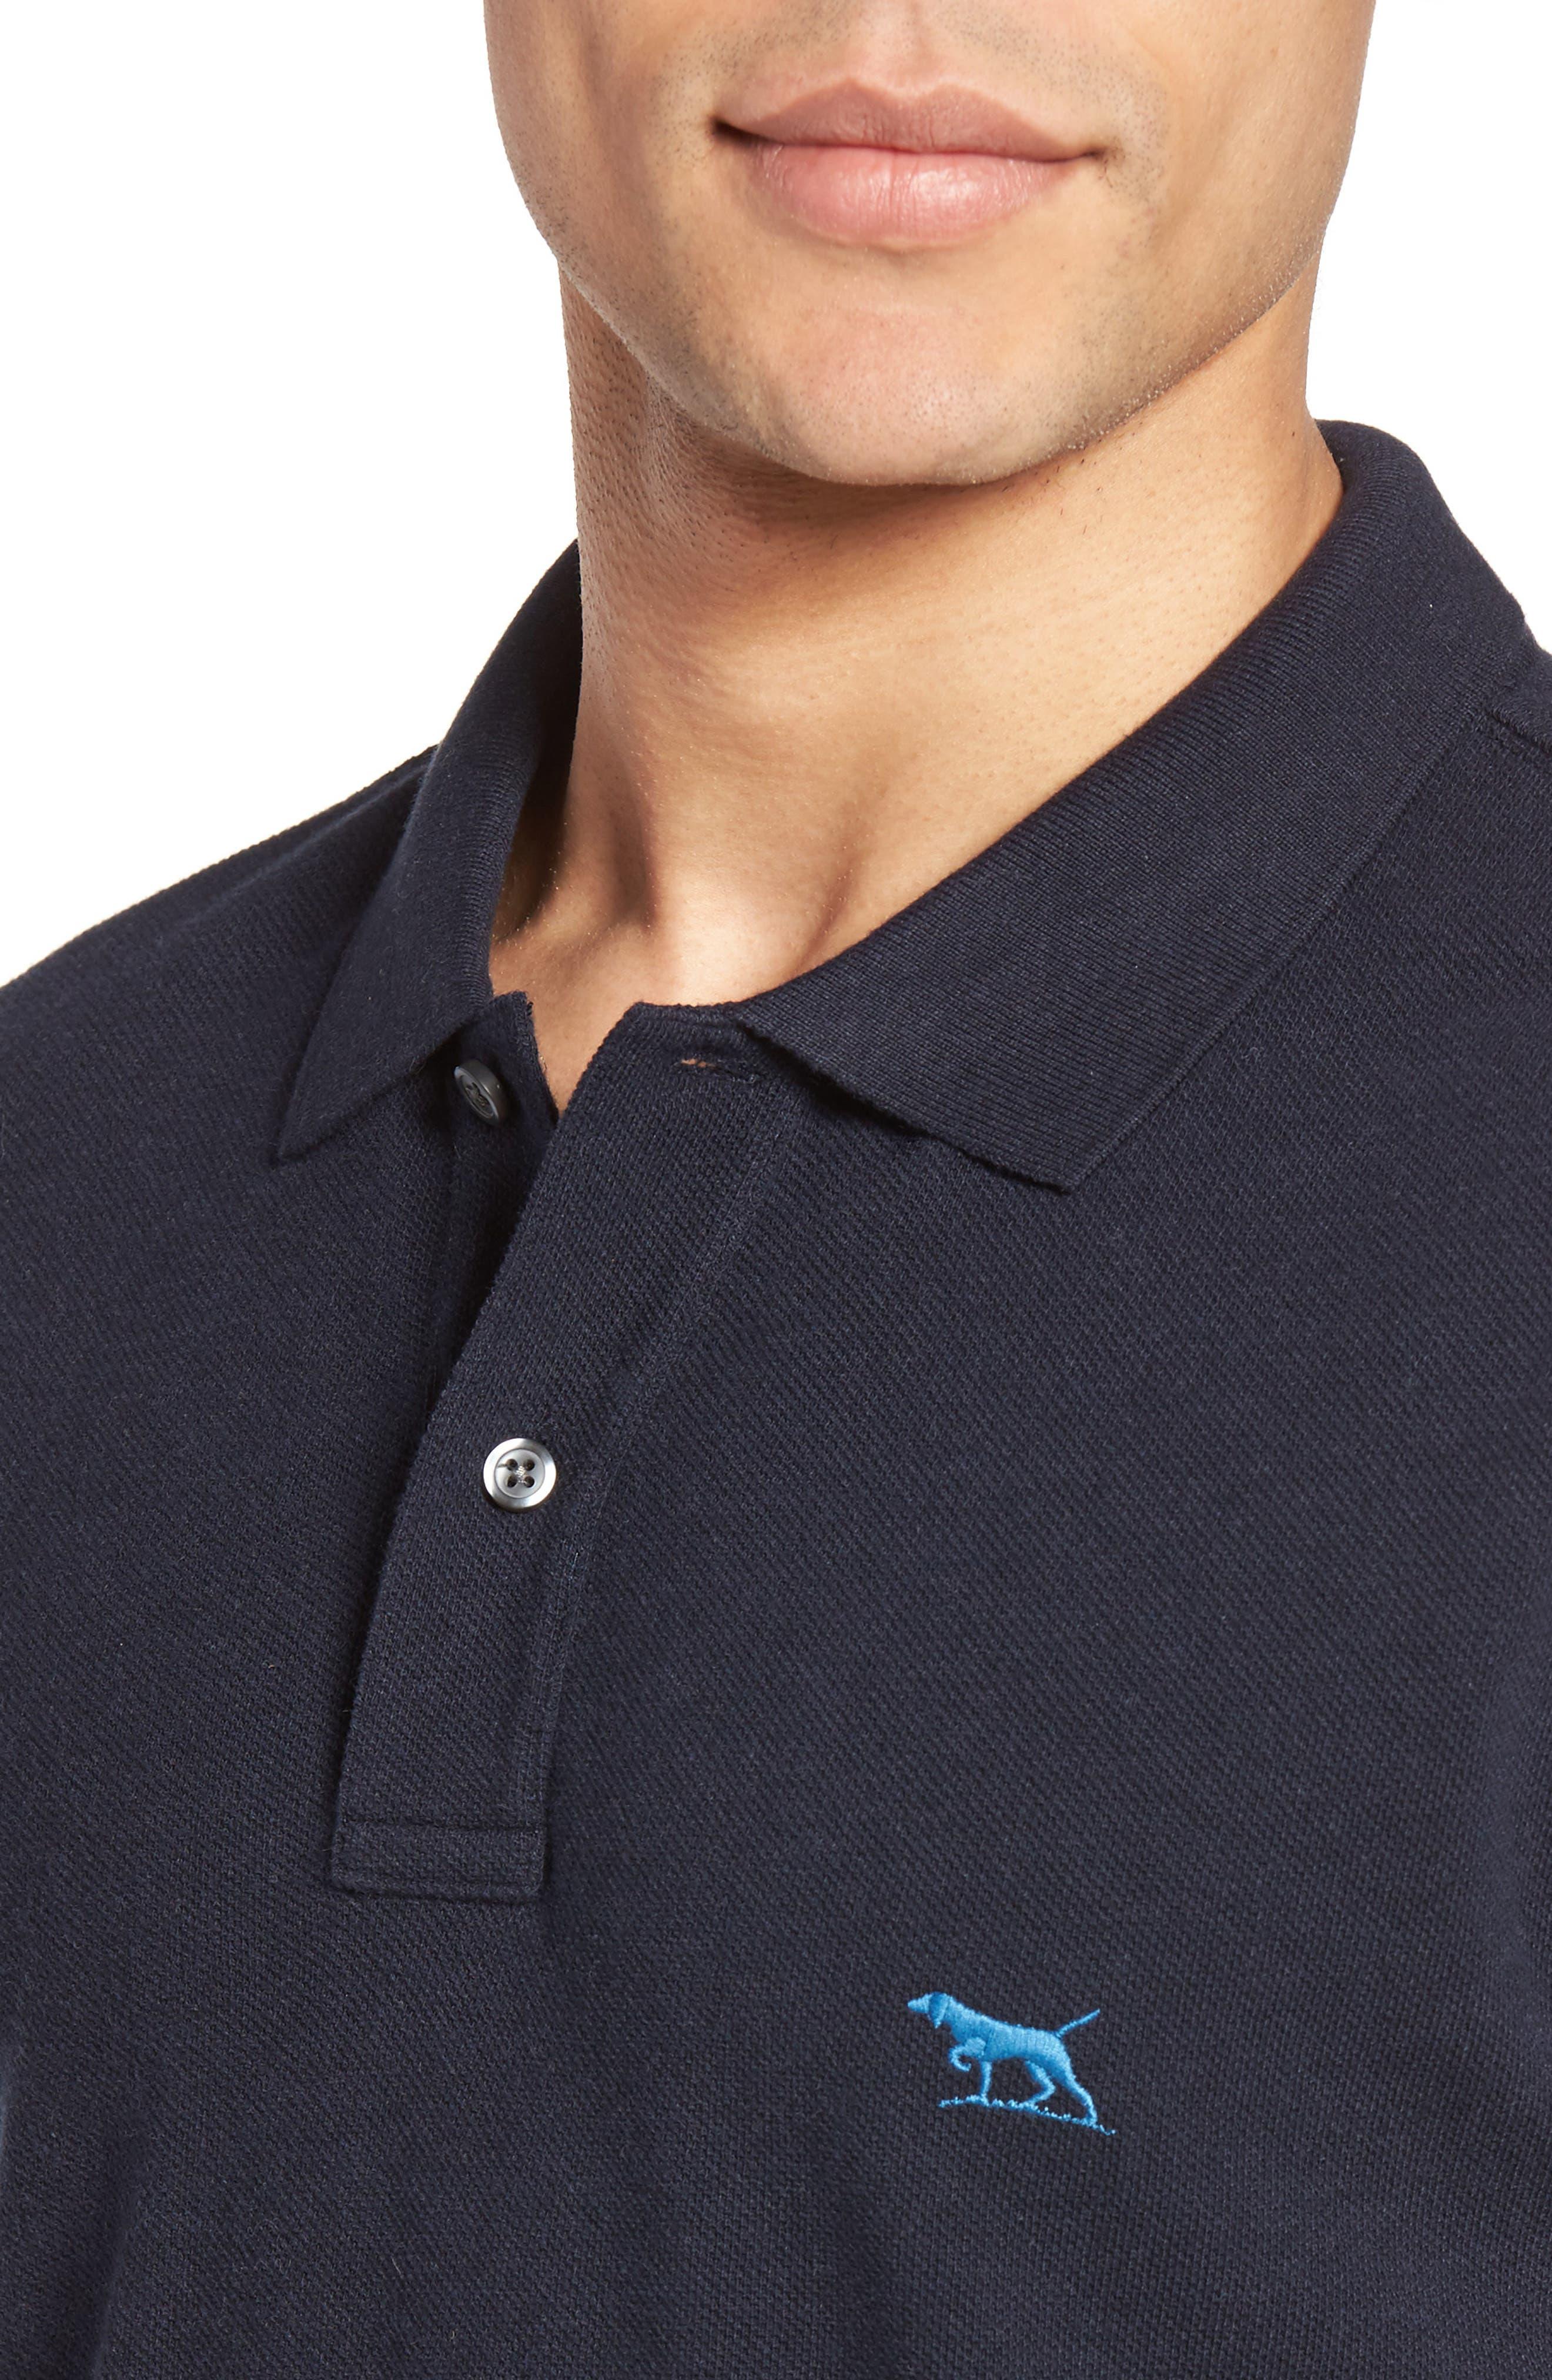 'The Gunn' Piqué Sports Fit Cotton Polo,                             Alternate thumbnail 4, color,                             Navy